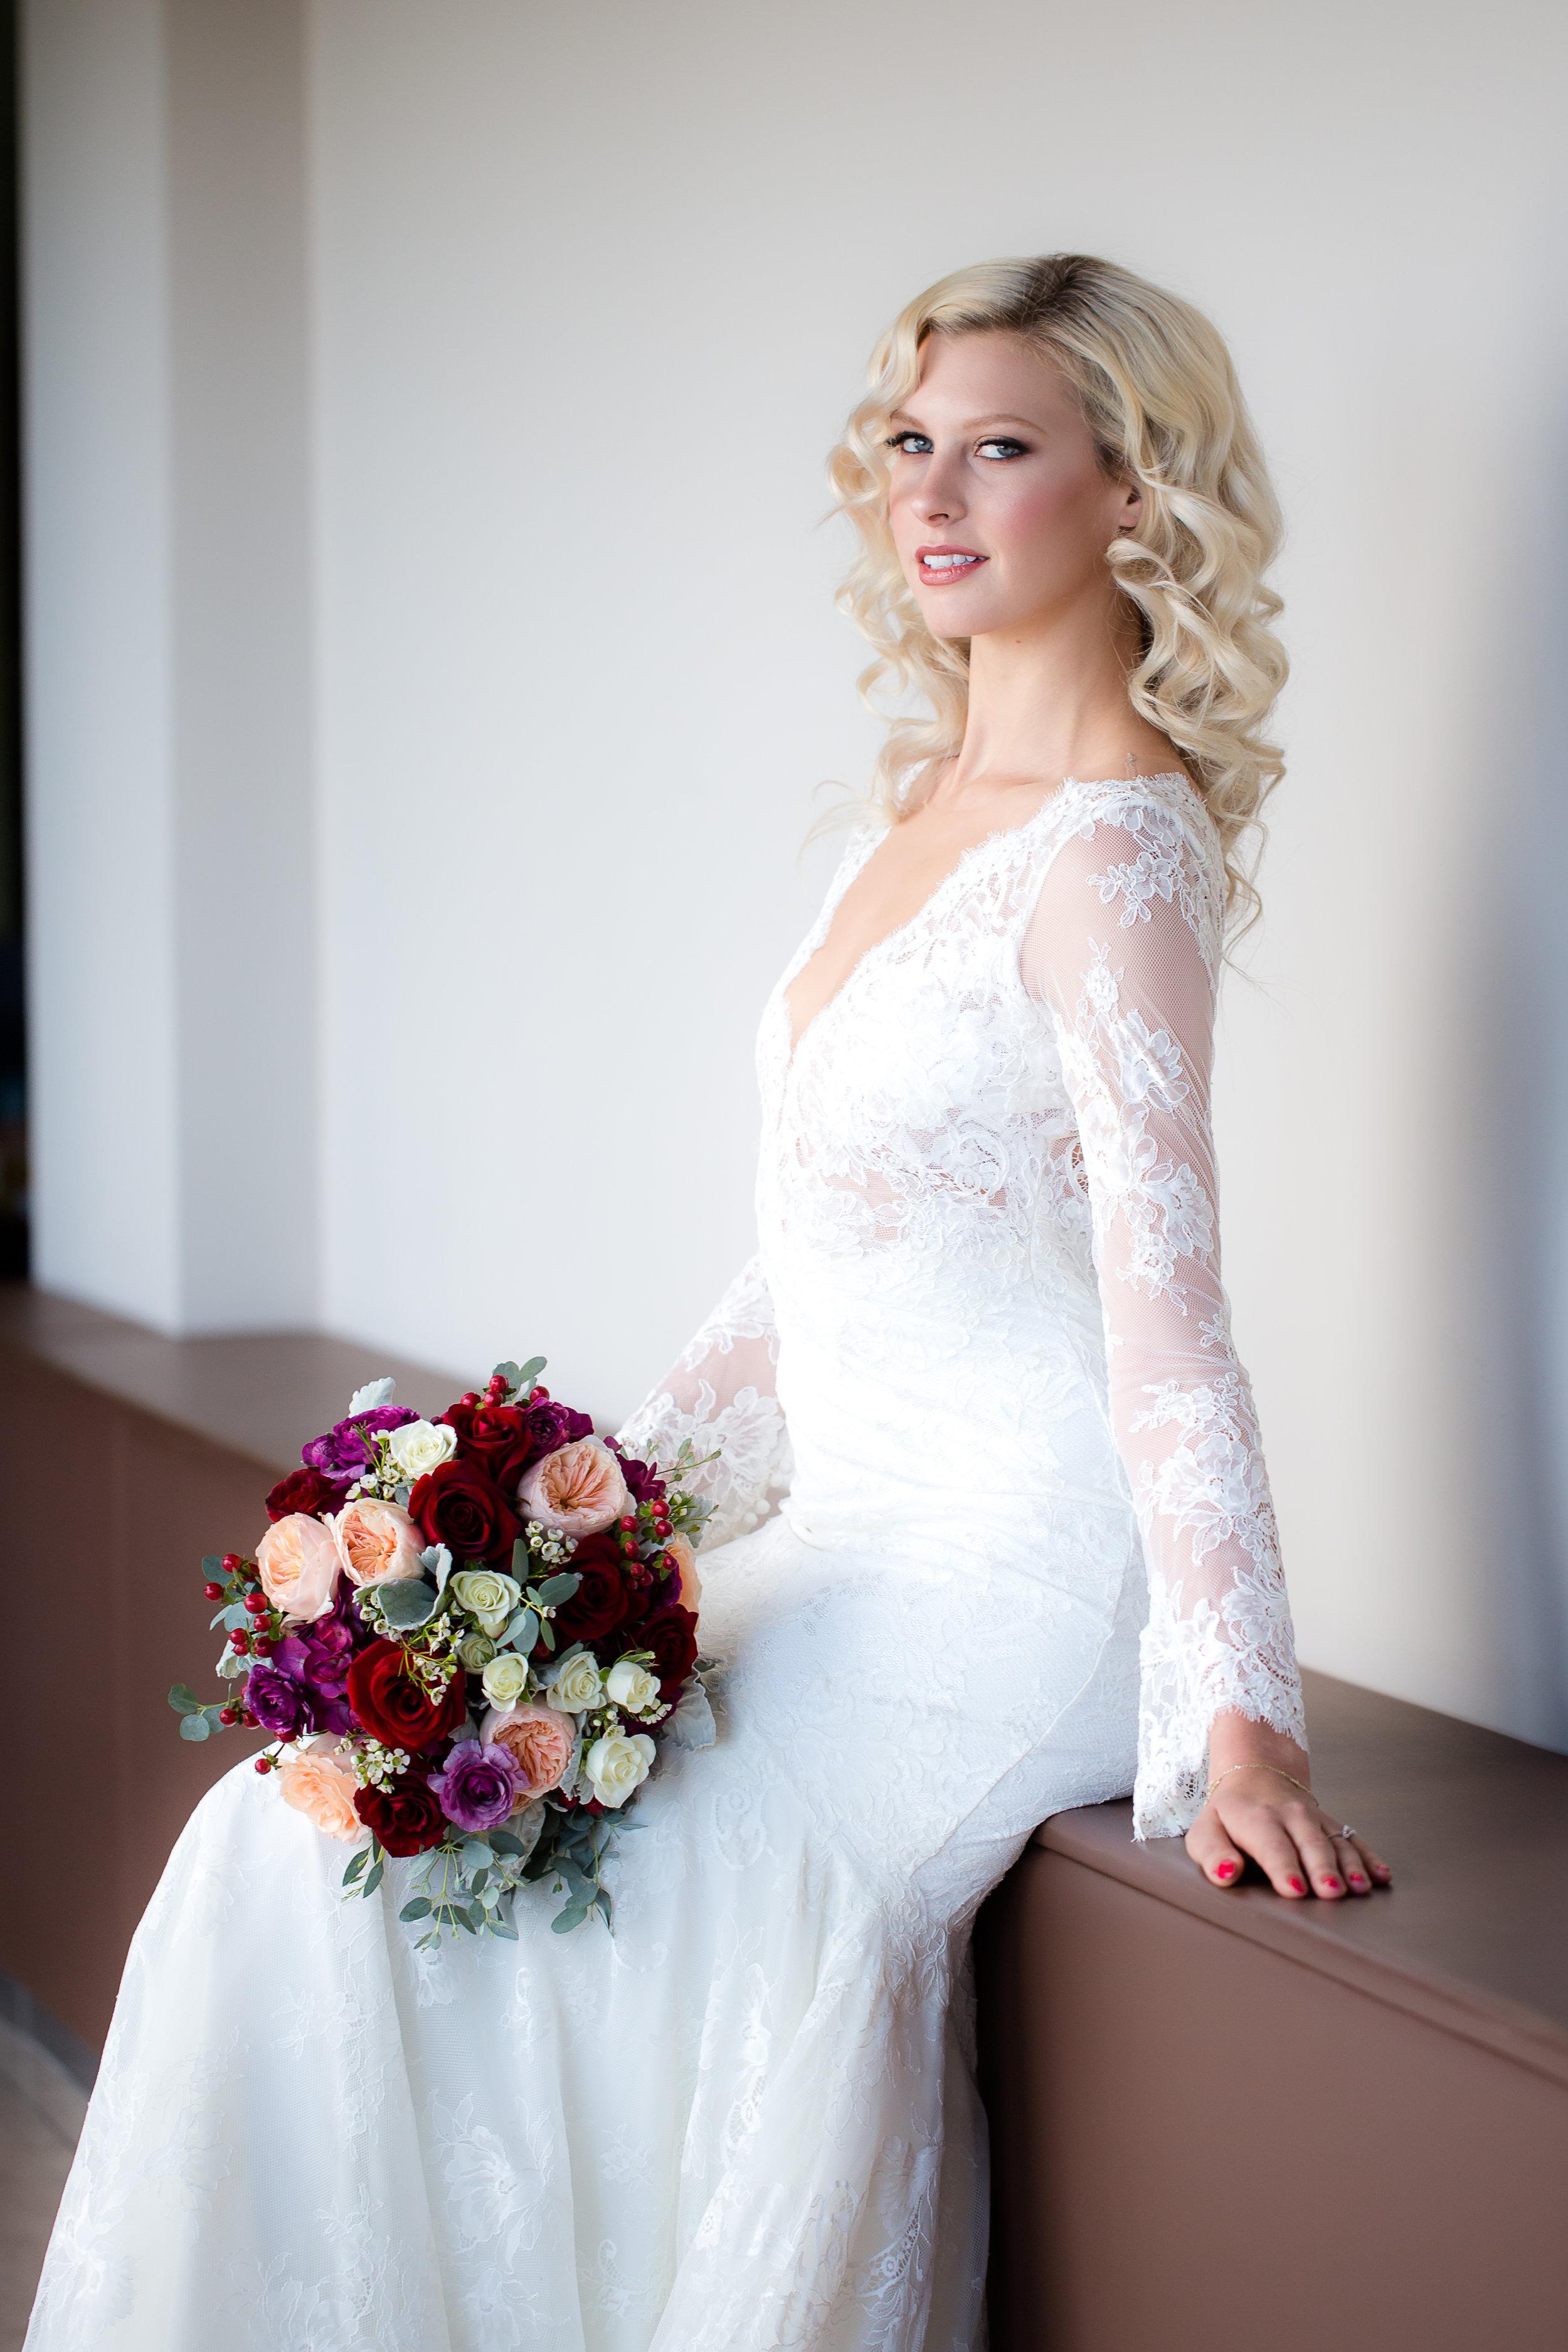 Perfect hair and makeup for Las Vegas wedding